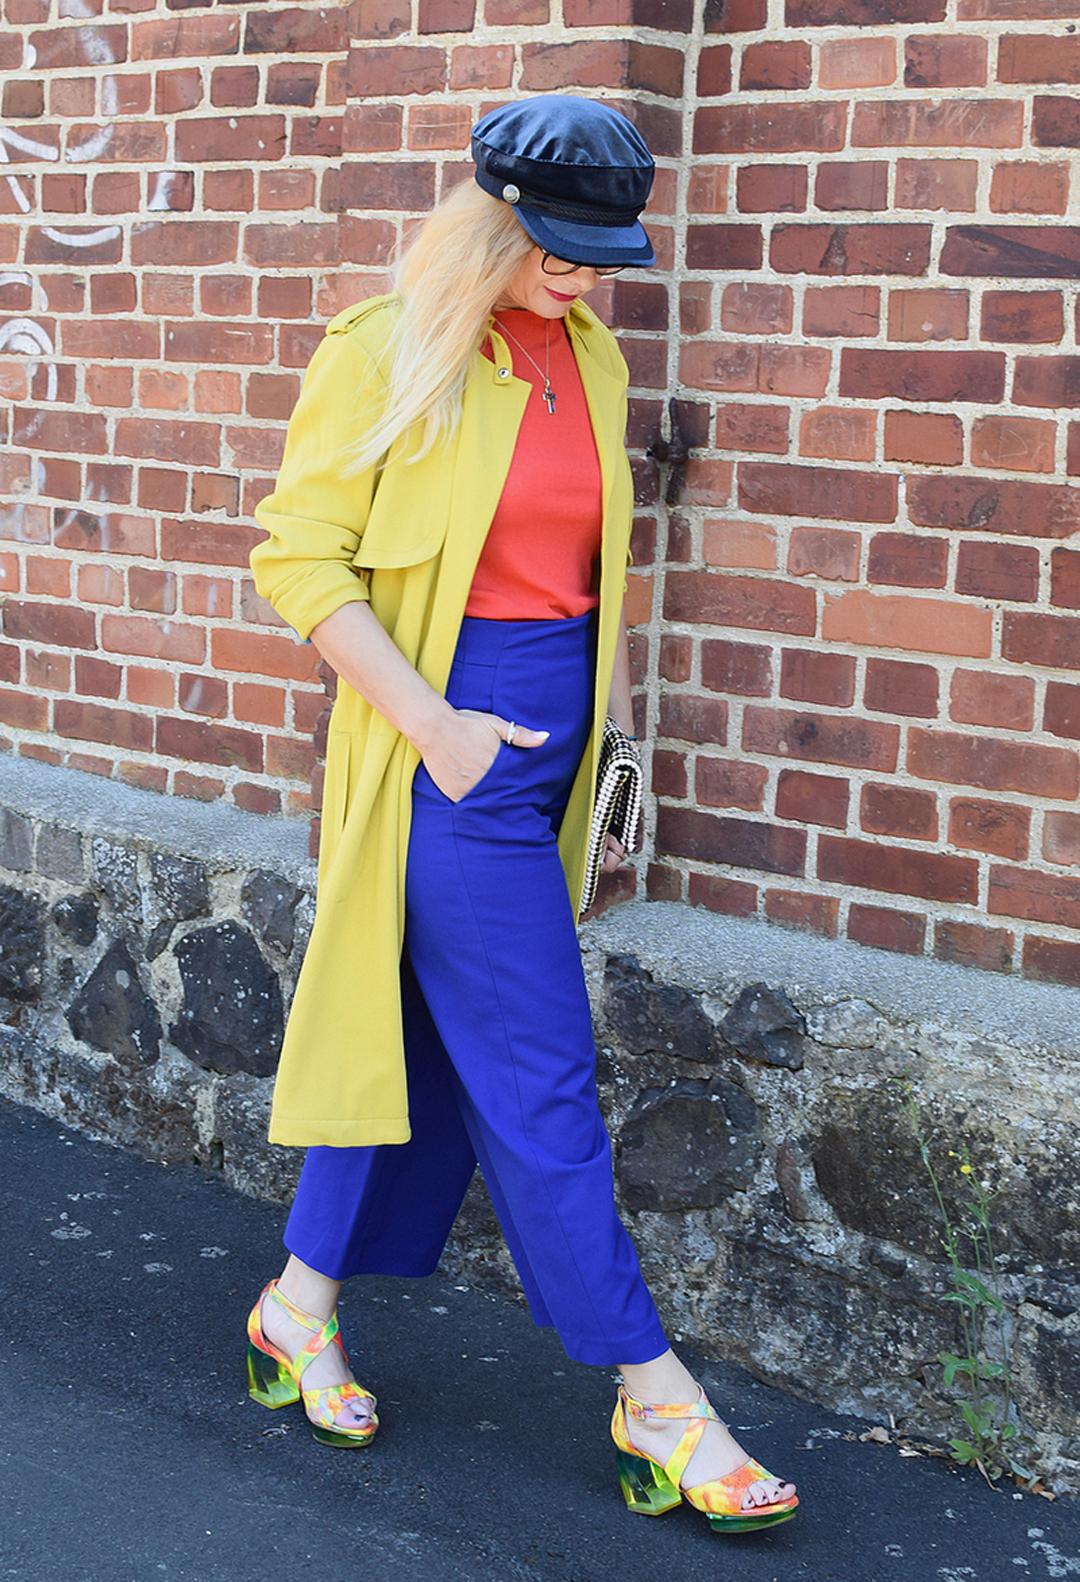 Tipps für ein Outfit in Color Blocking, Colorblocking Modeblogger